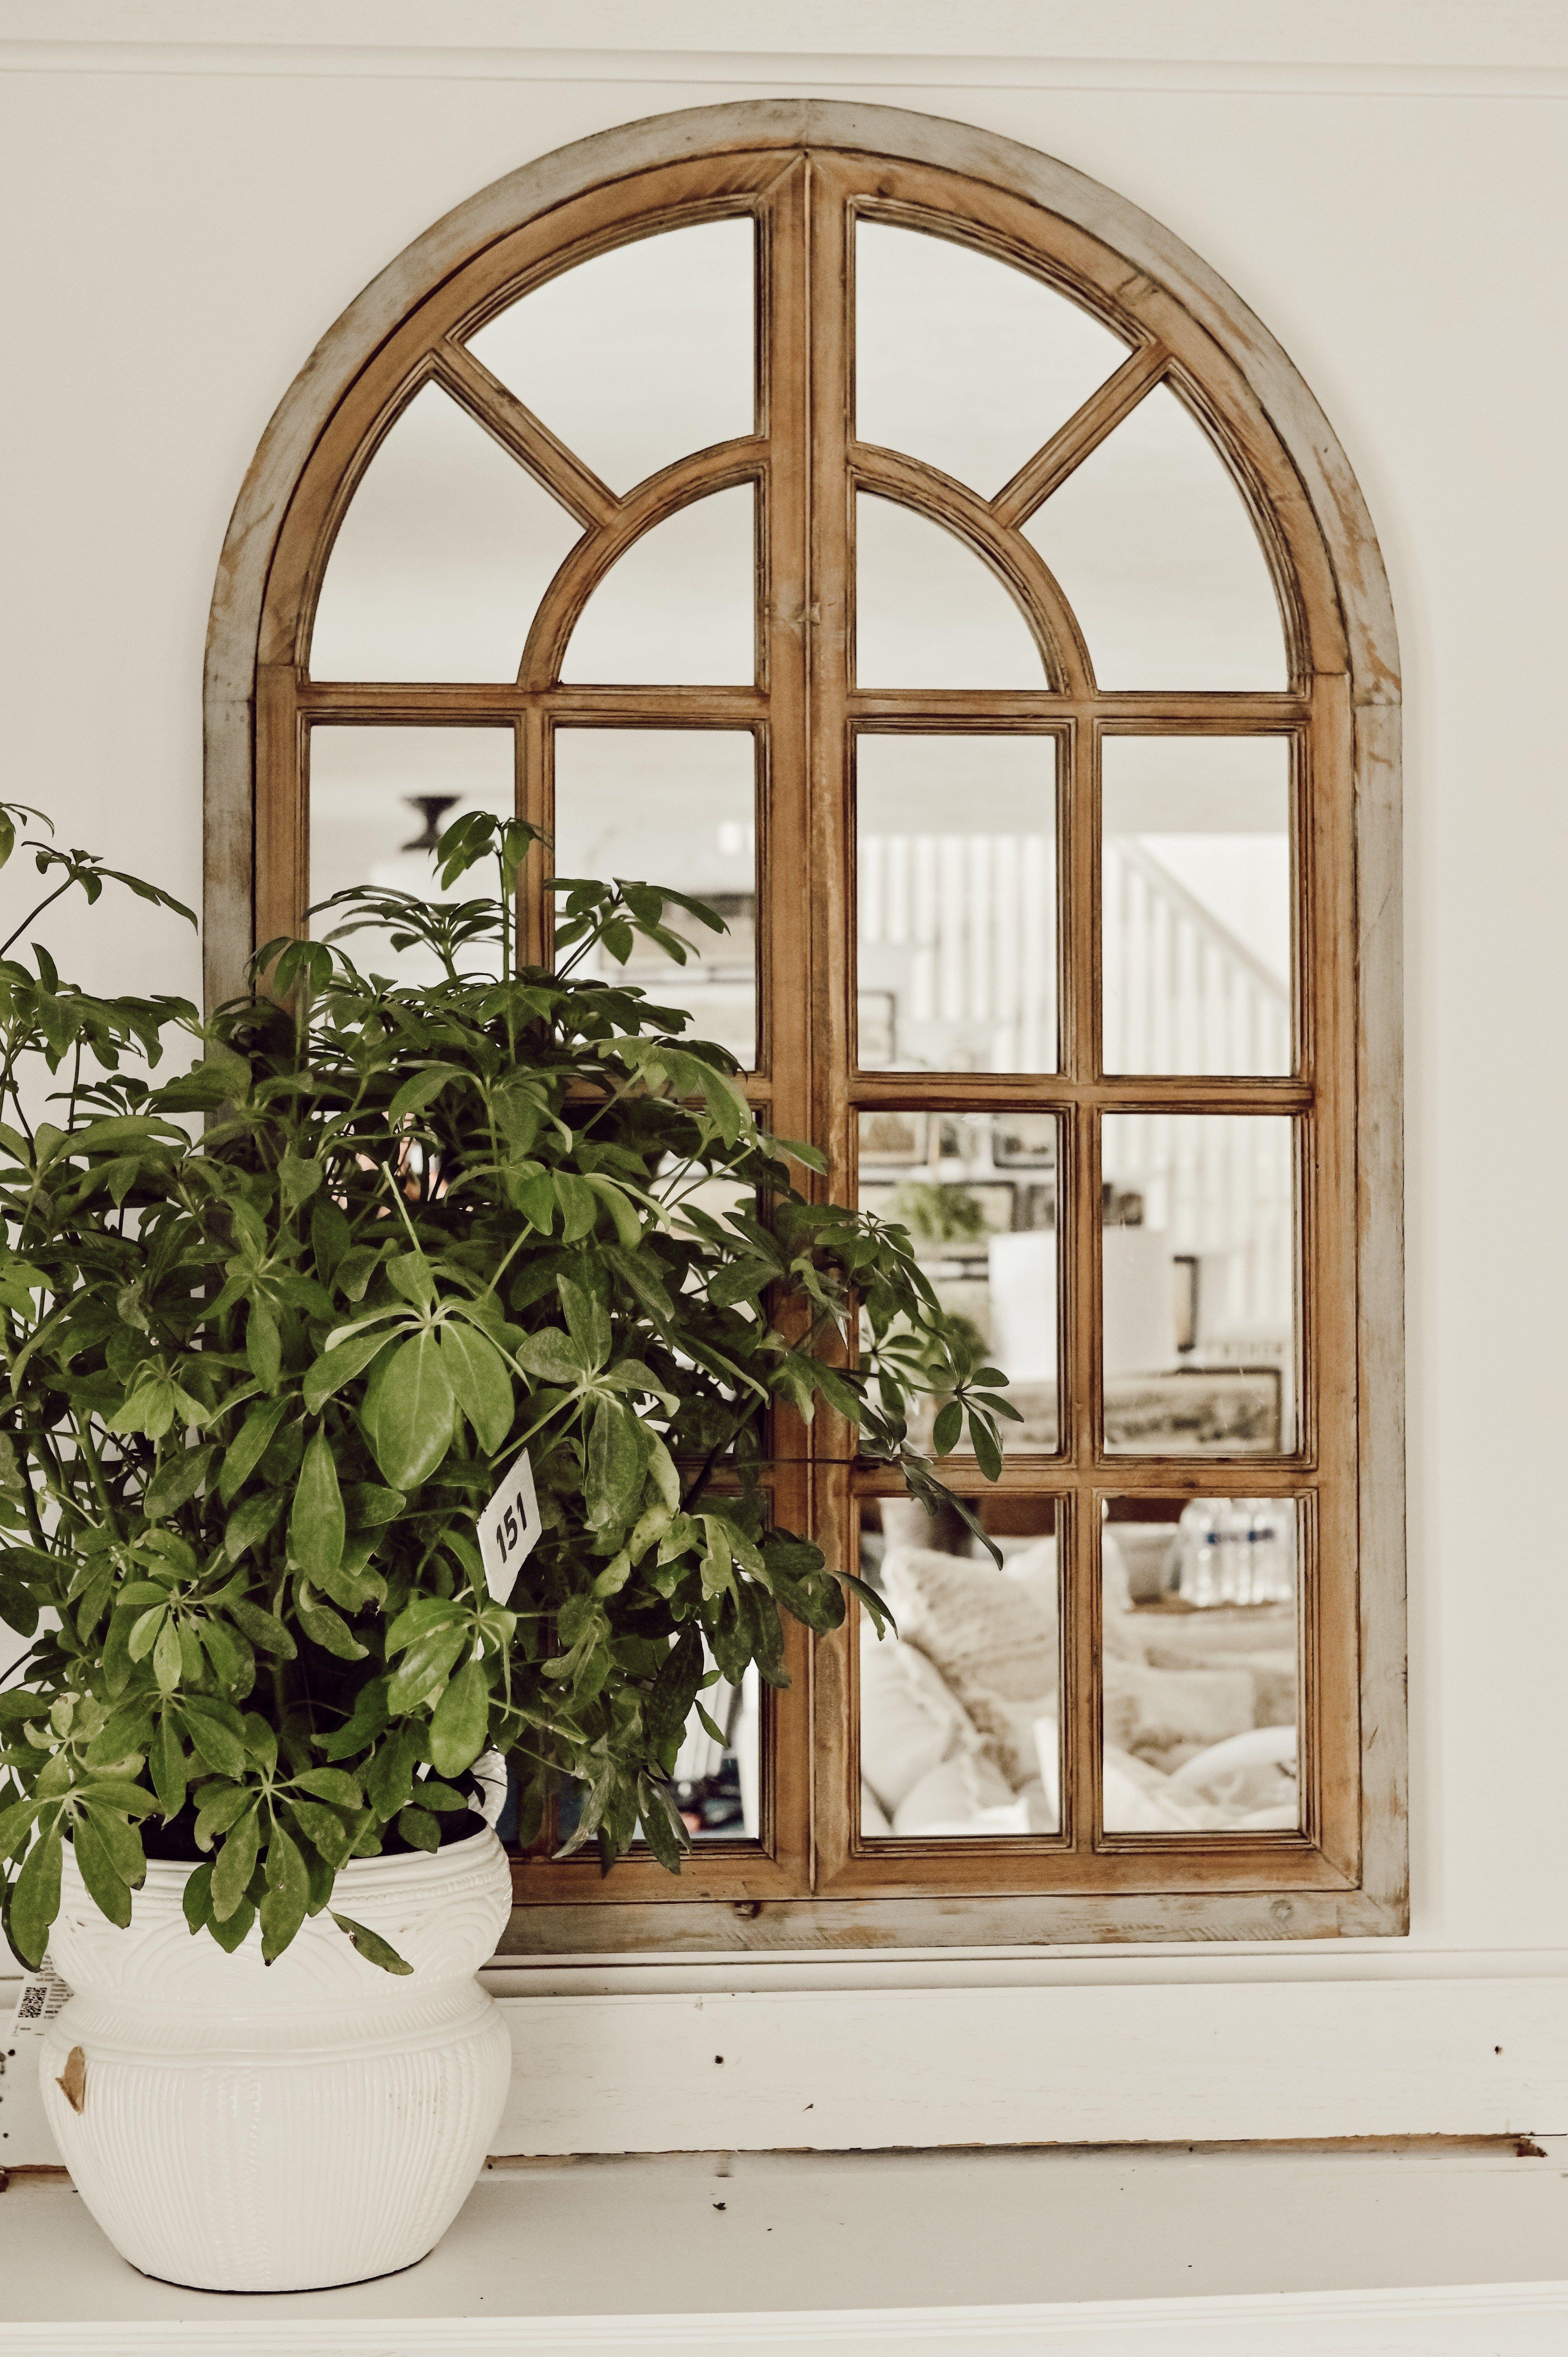 Rustic Farmhouse Arched Window mirror Arched window